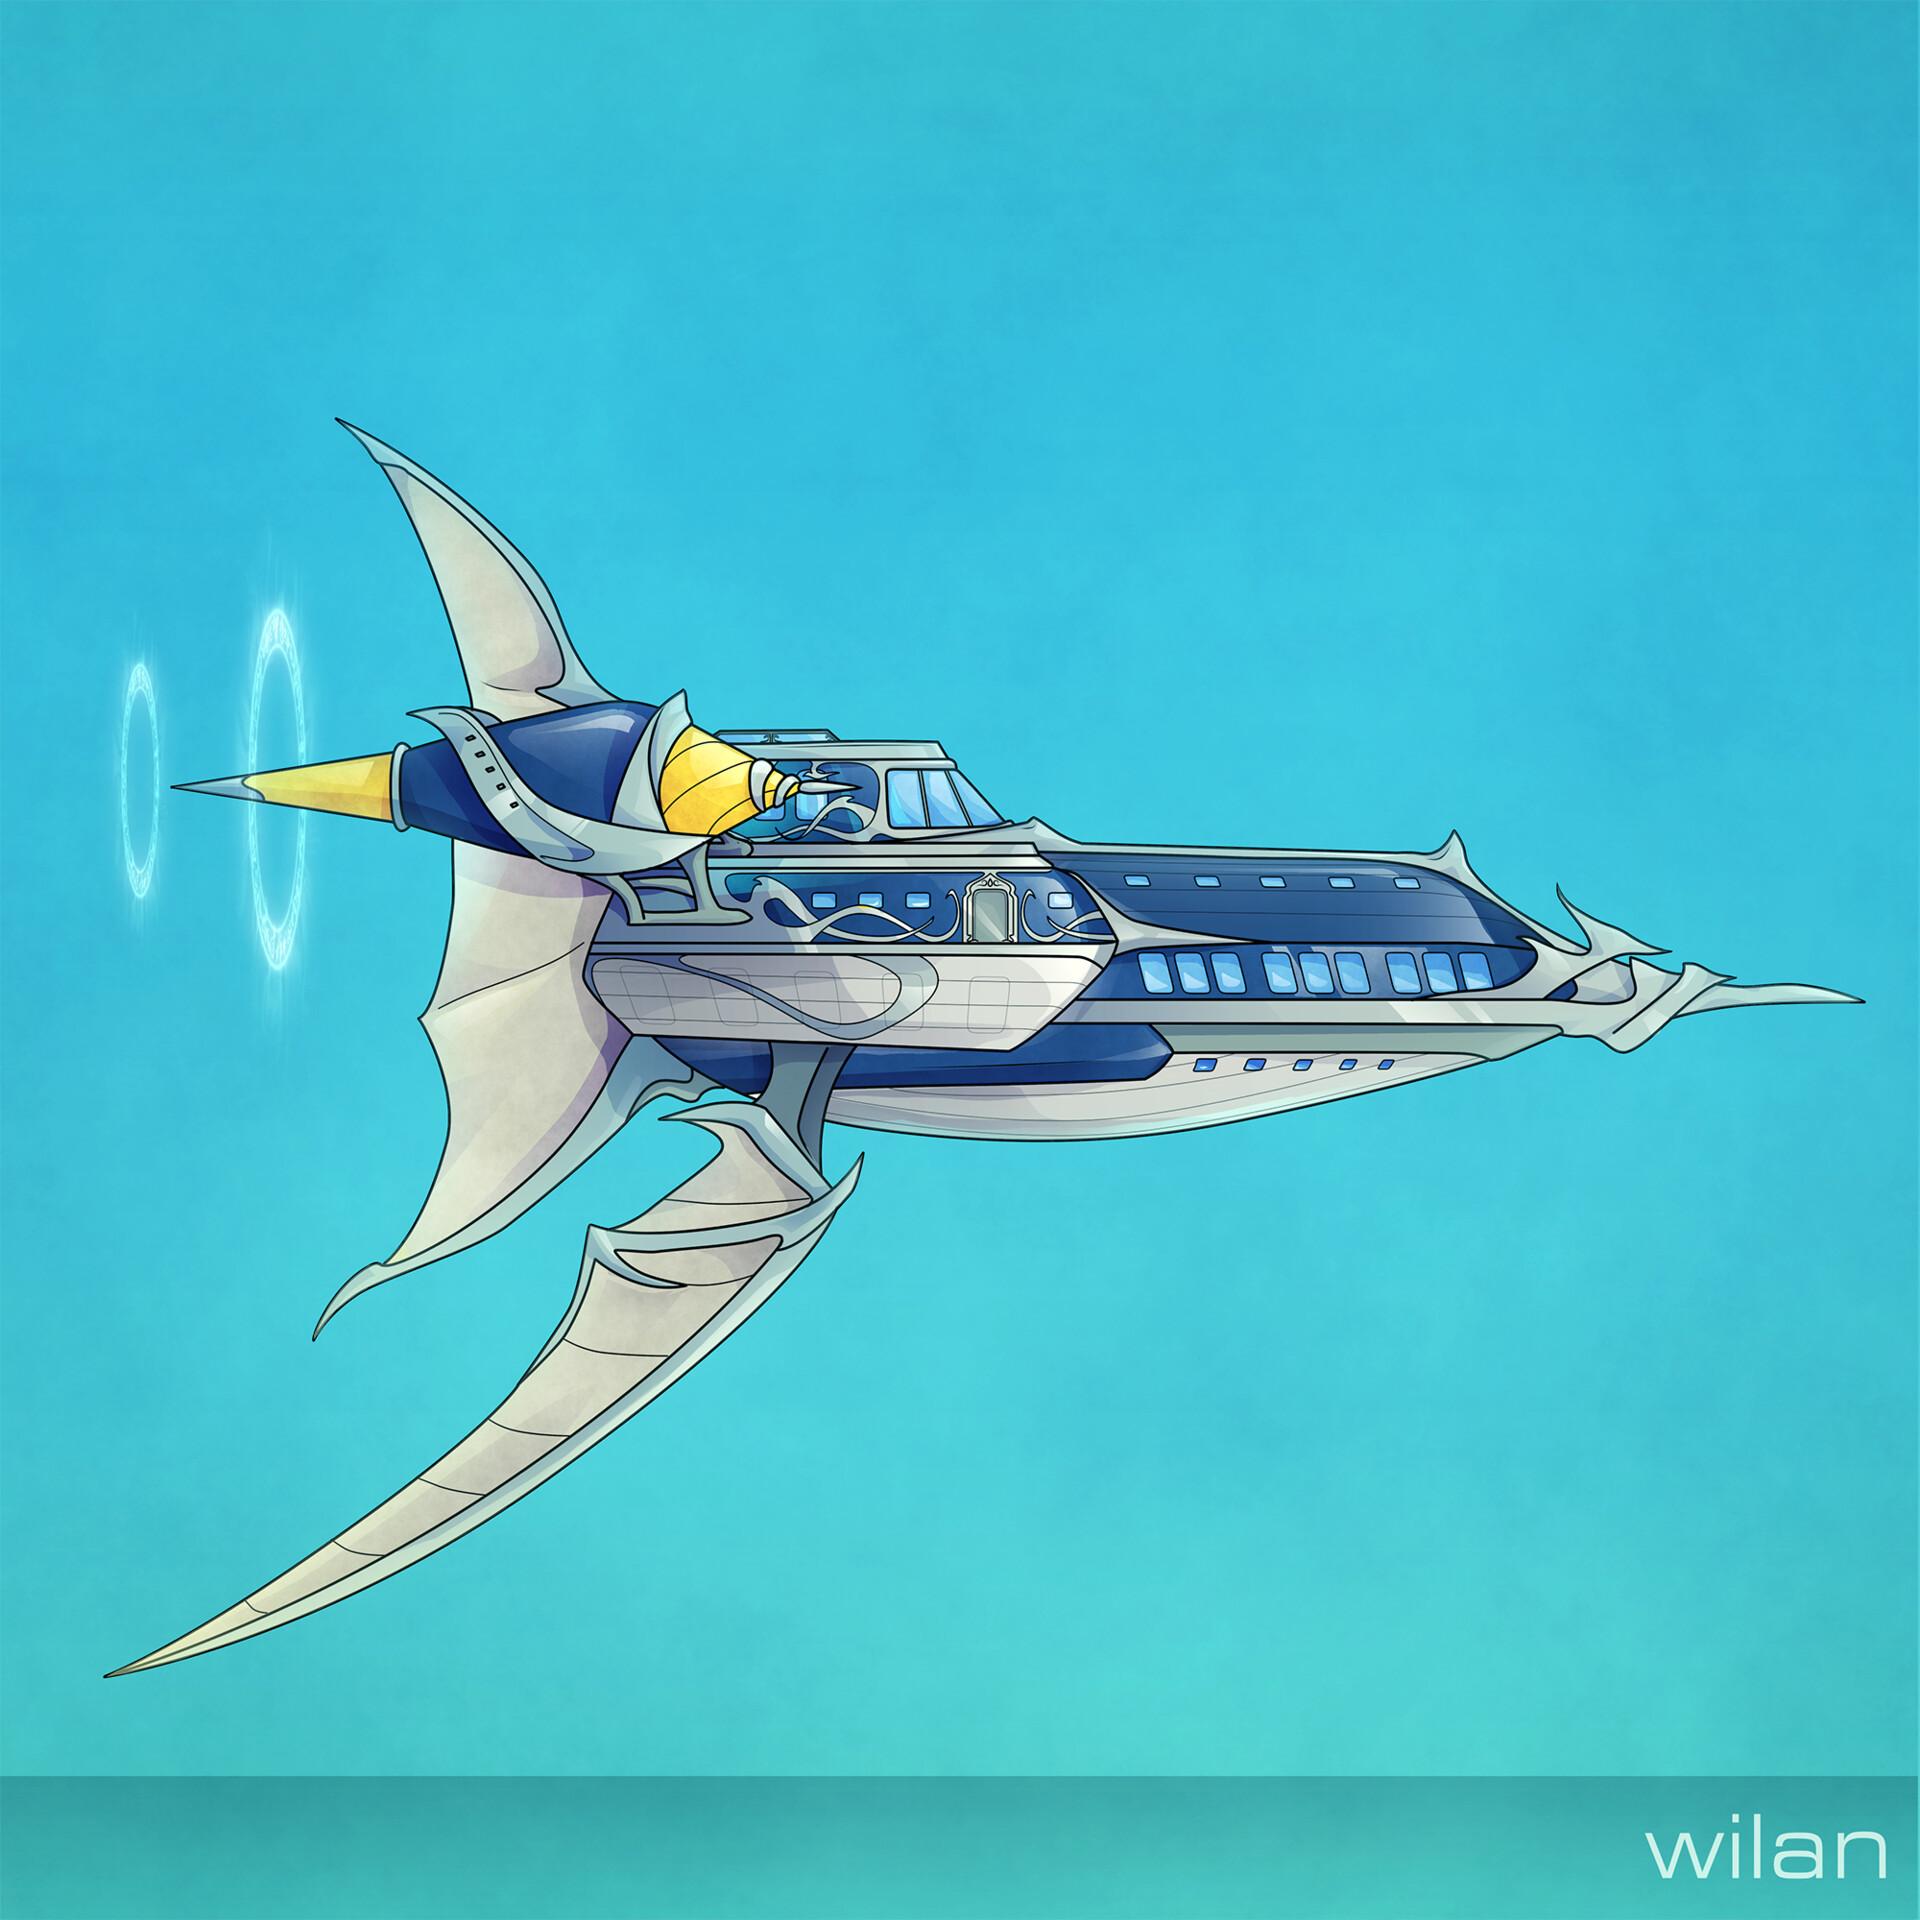 Wilan Serulia - Airyacht - steampunk-fantasy airship design on